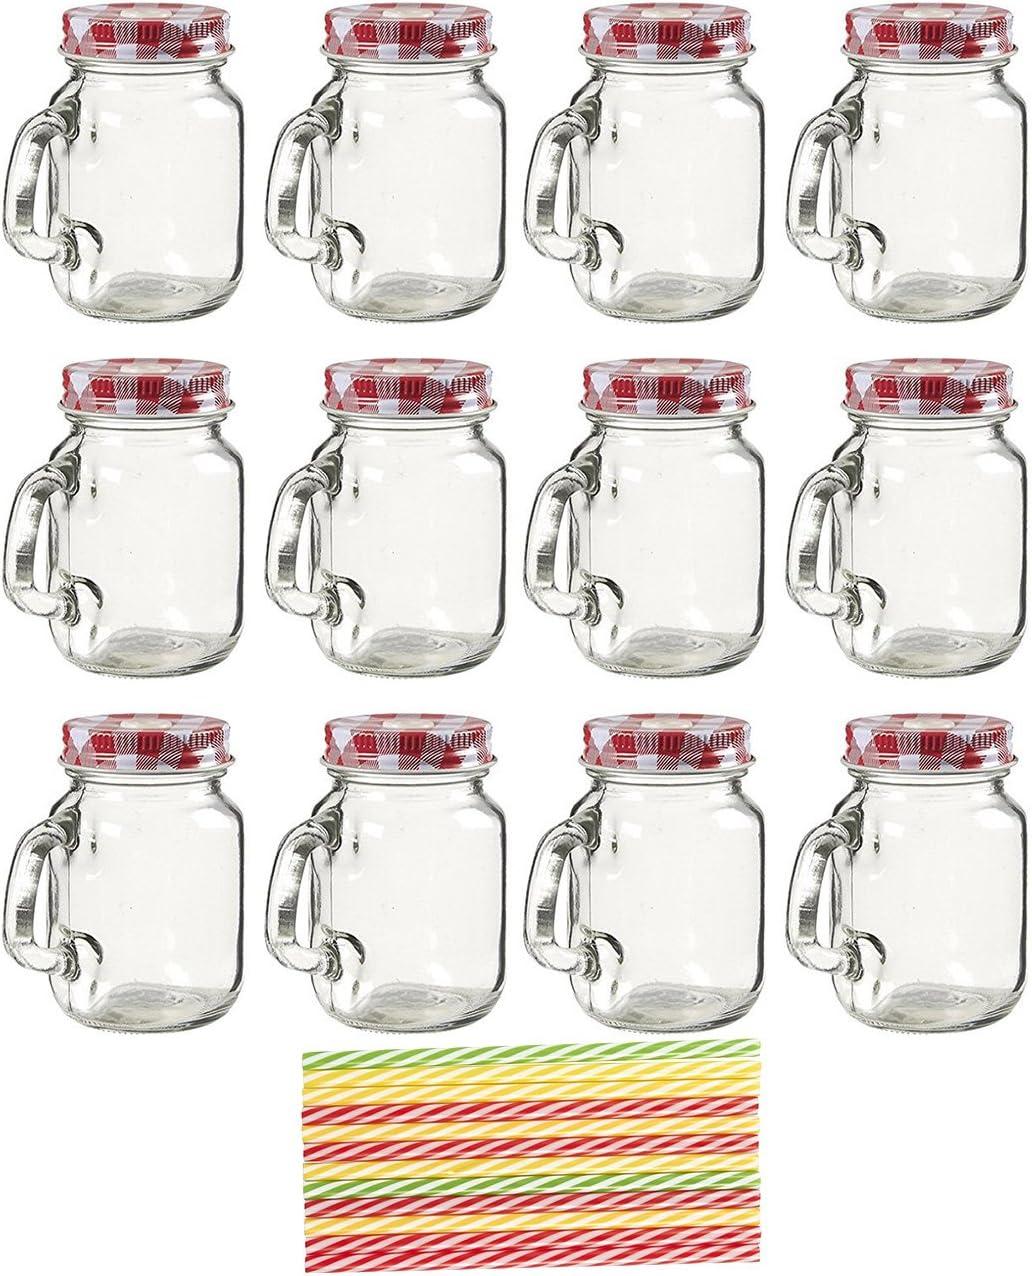 Juvale Mini Mason Jar Mugs with Lids and Straws (12 Pack)